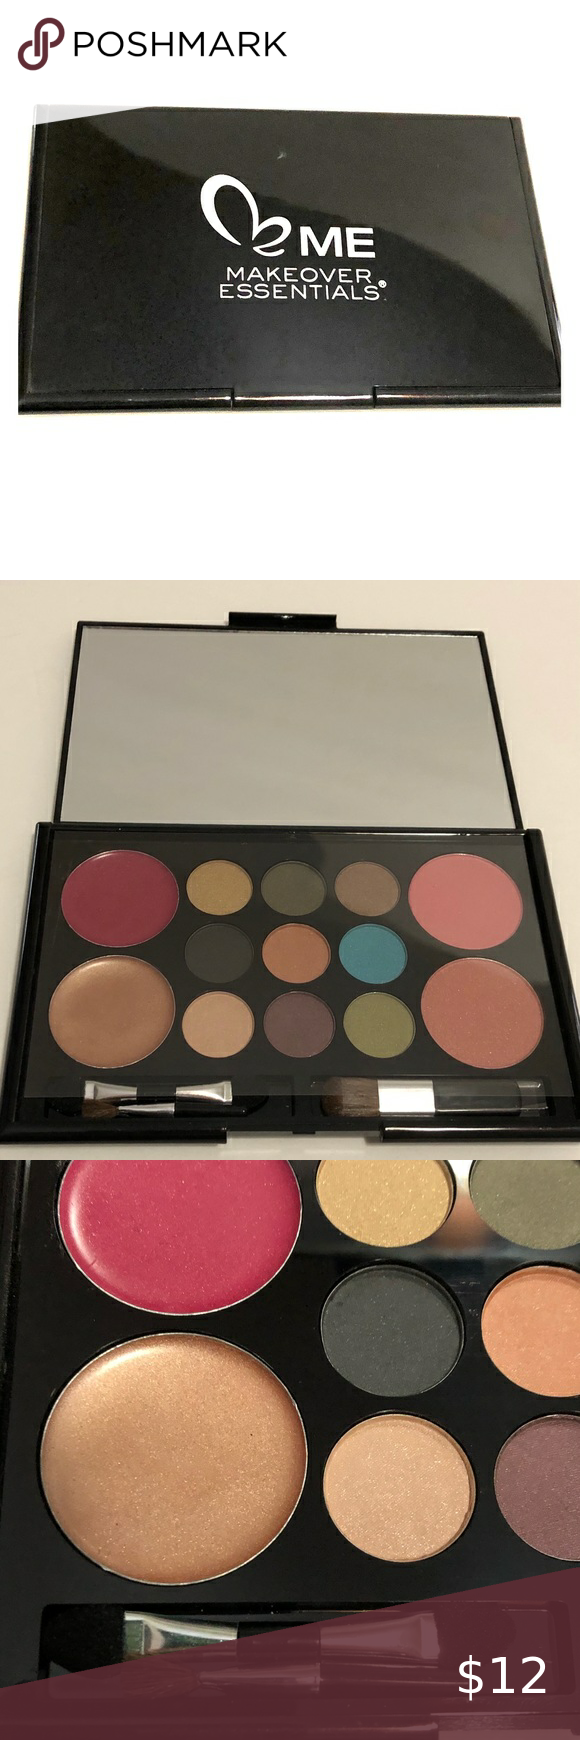 Me Makeover Essentials Face Color Kit Nwot In 2020 Color Kit Makeover Essentials Lip Colors